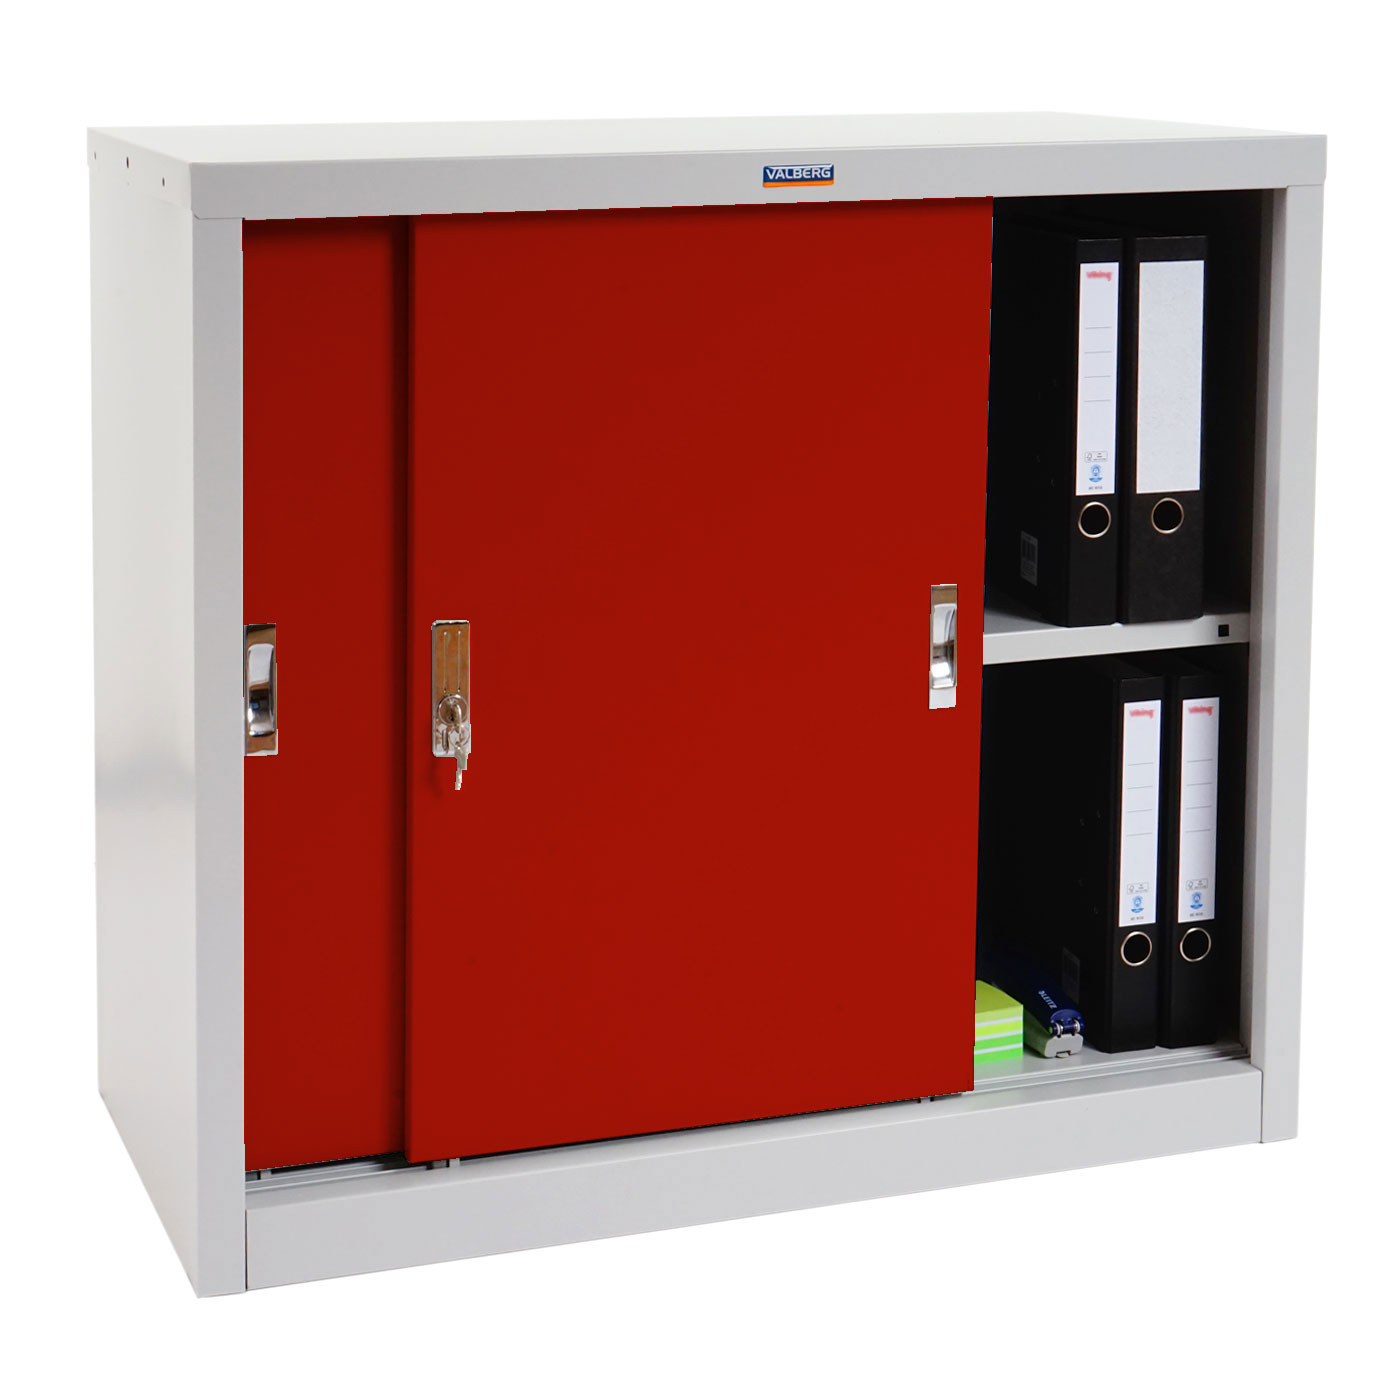 Metallschrank Büroschrank 2 Türen 83x91x46cm rot Aktenschrank Valberg H333